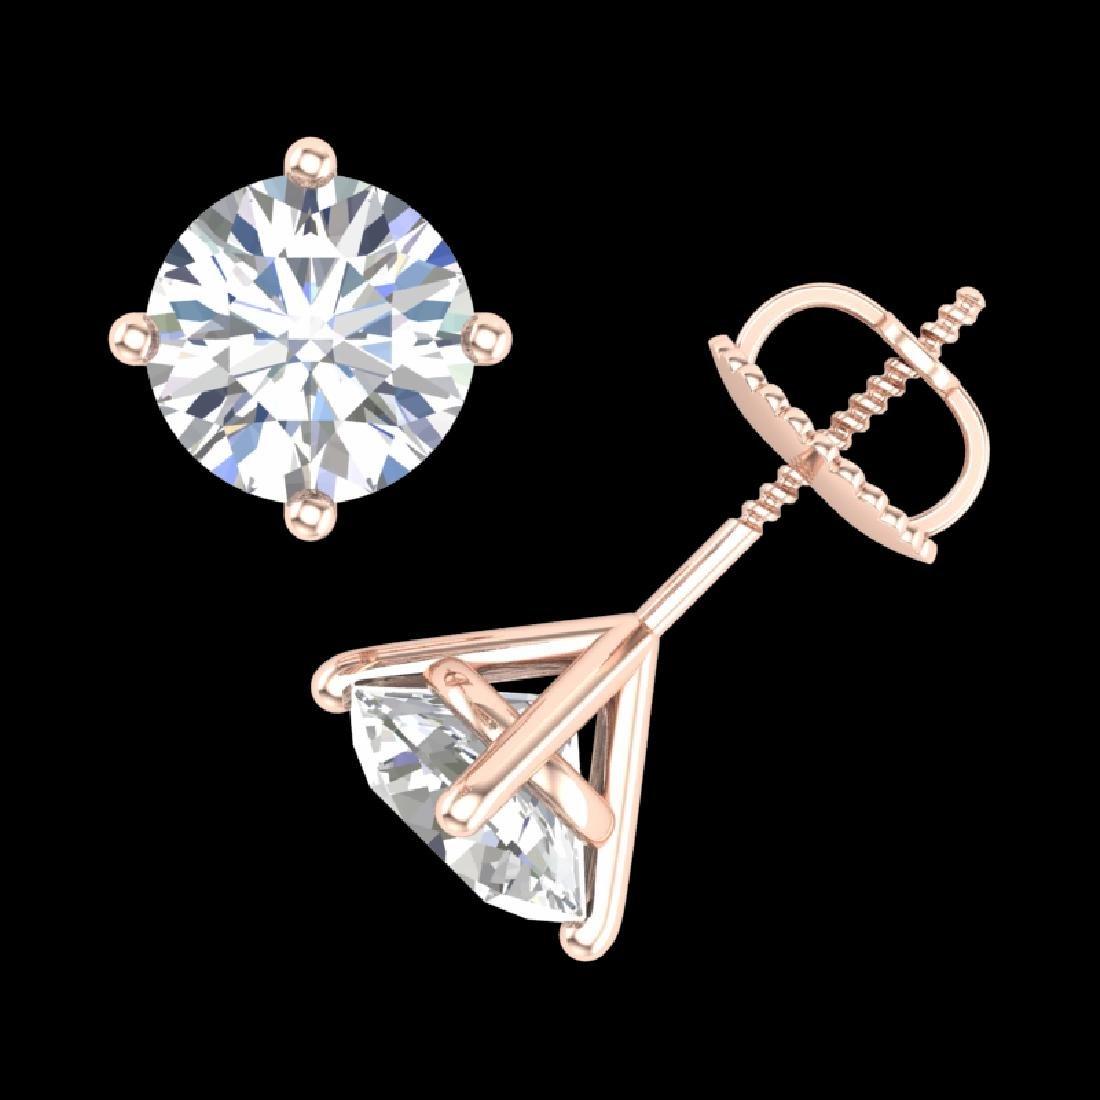 2.5 CTW VS/SI Diamond Solitaire Art Deco Stud Earrings - 3